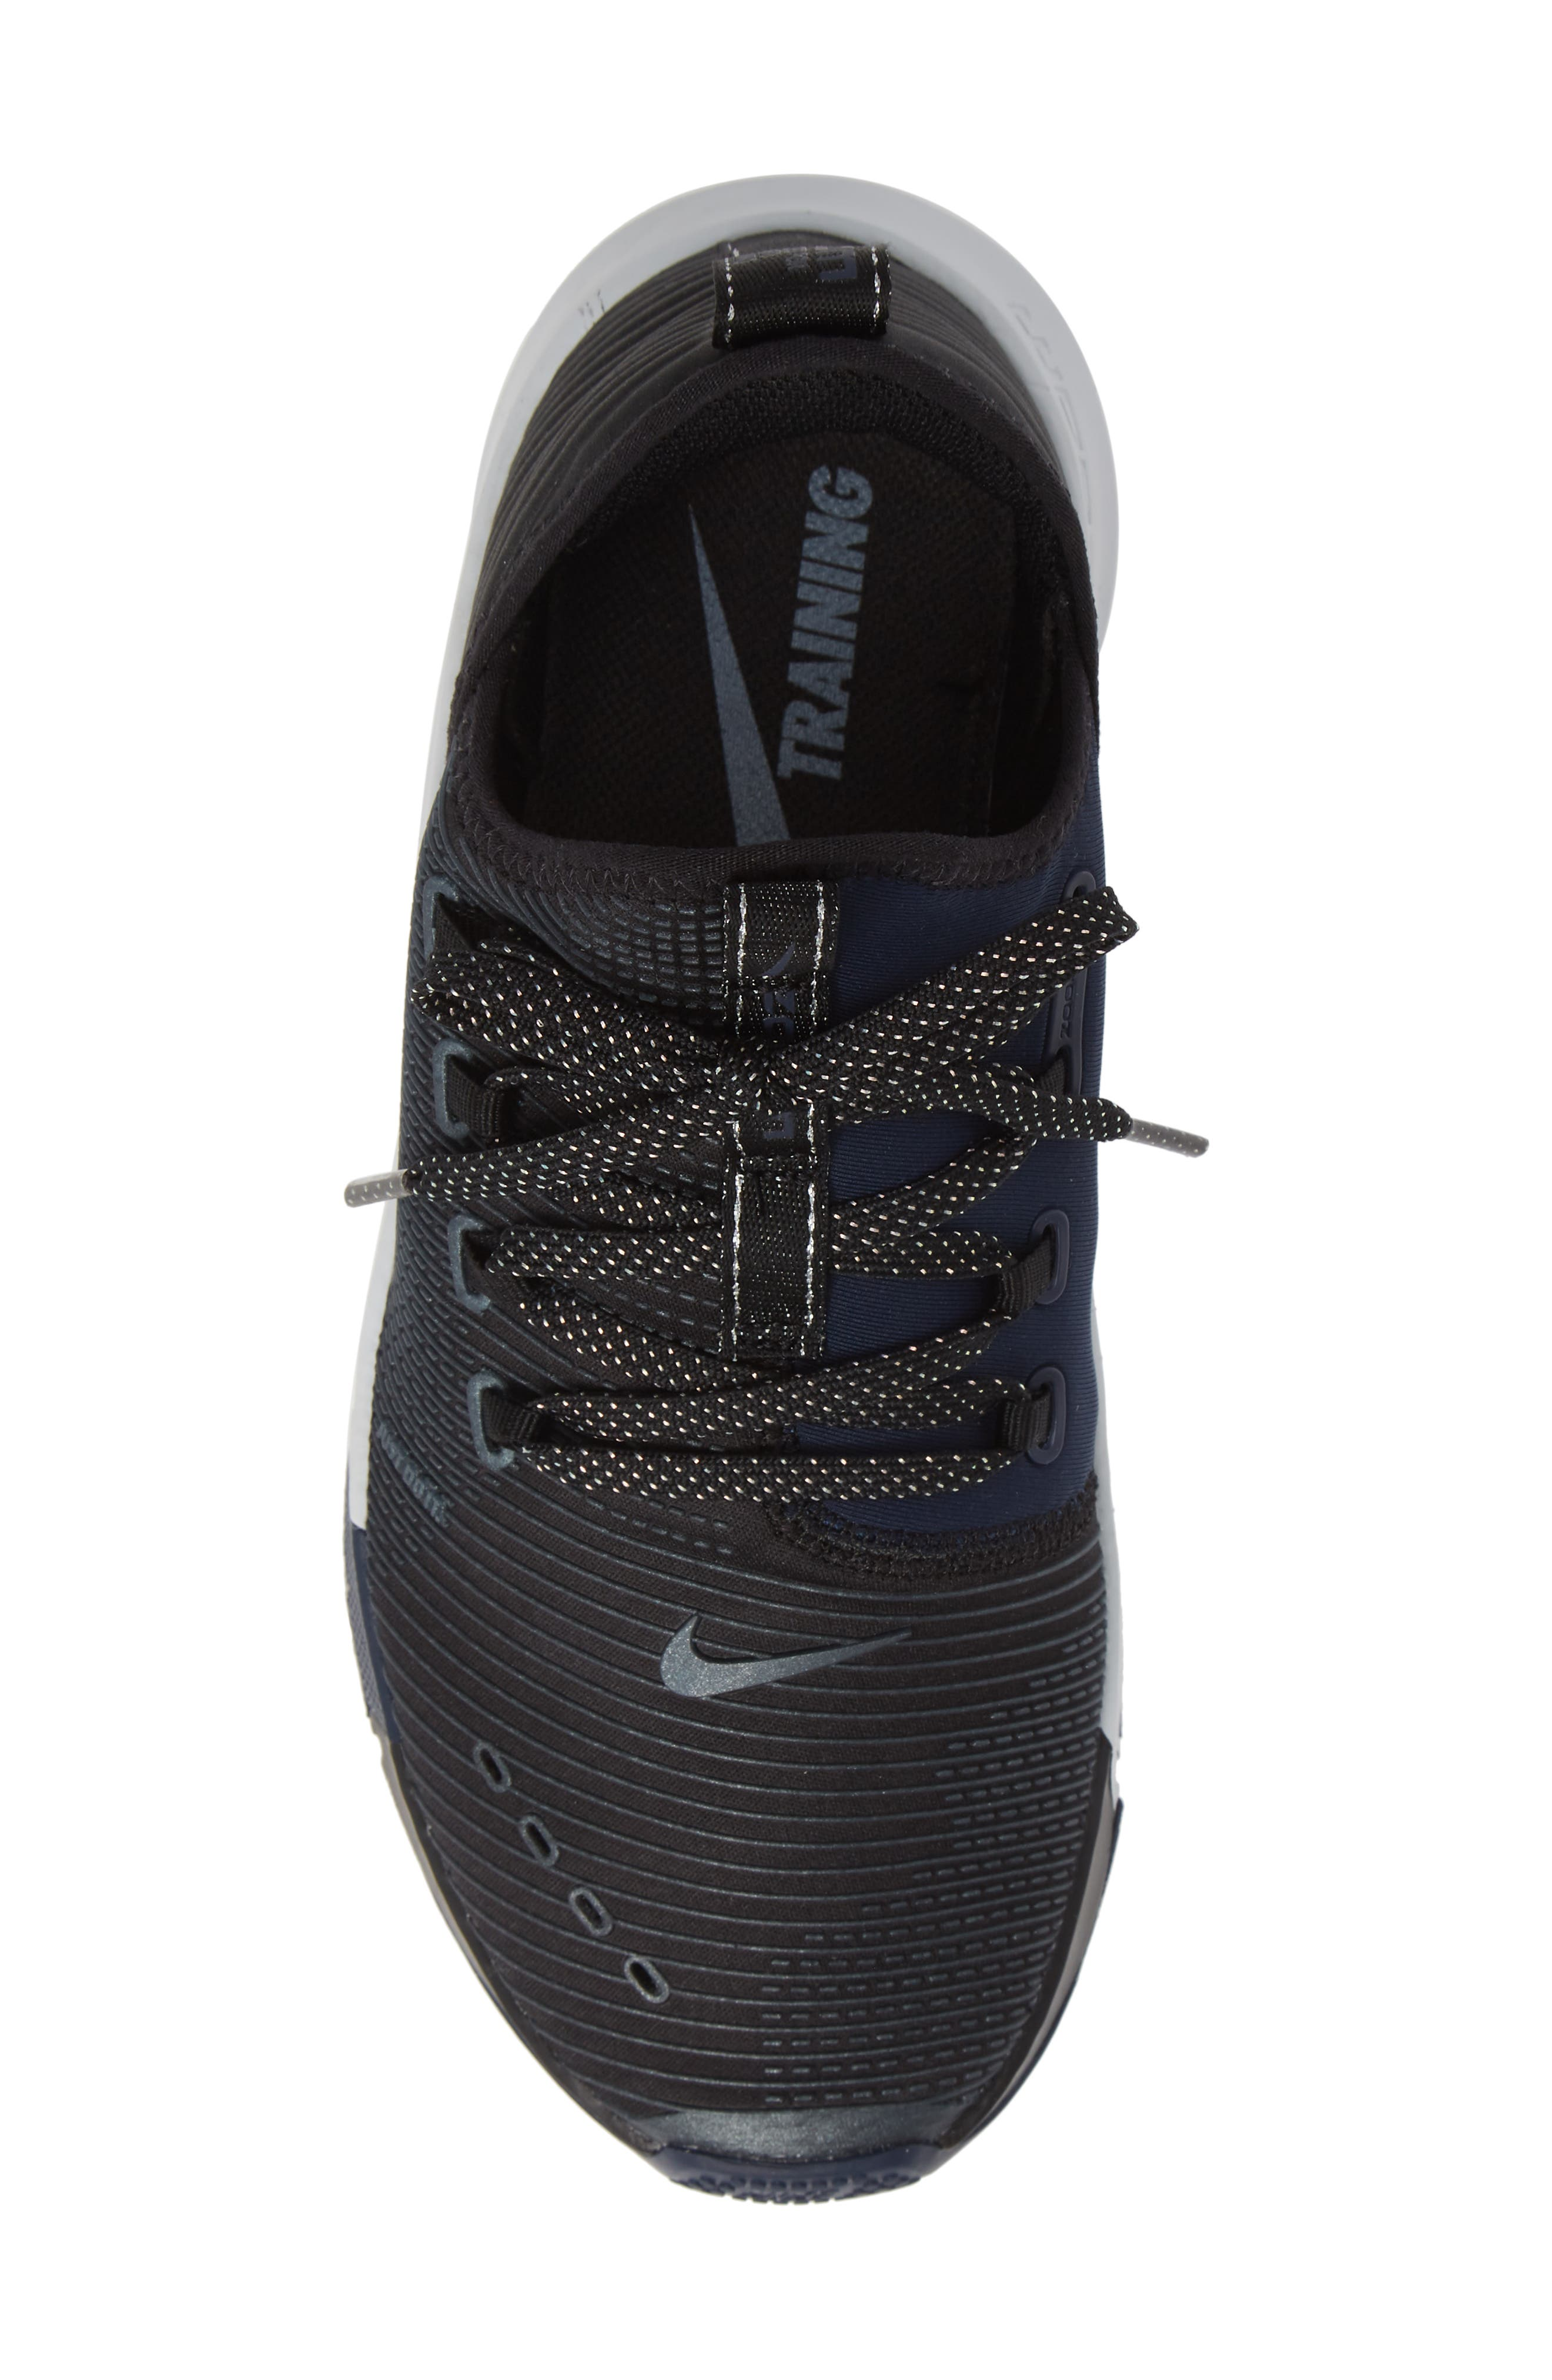 NIKE,                             Air Zoom Elevate Training Shoe,                             Alternate thumbnail 5, color,                             BLACK/ METALLIC NAVY- NAVY